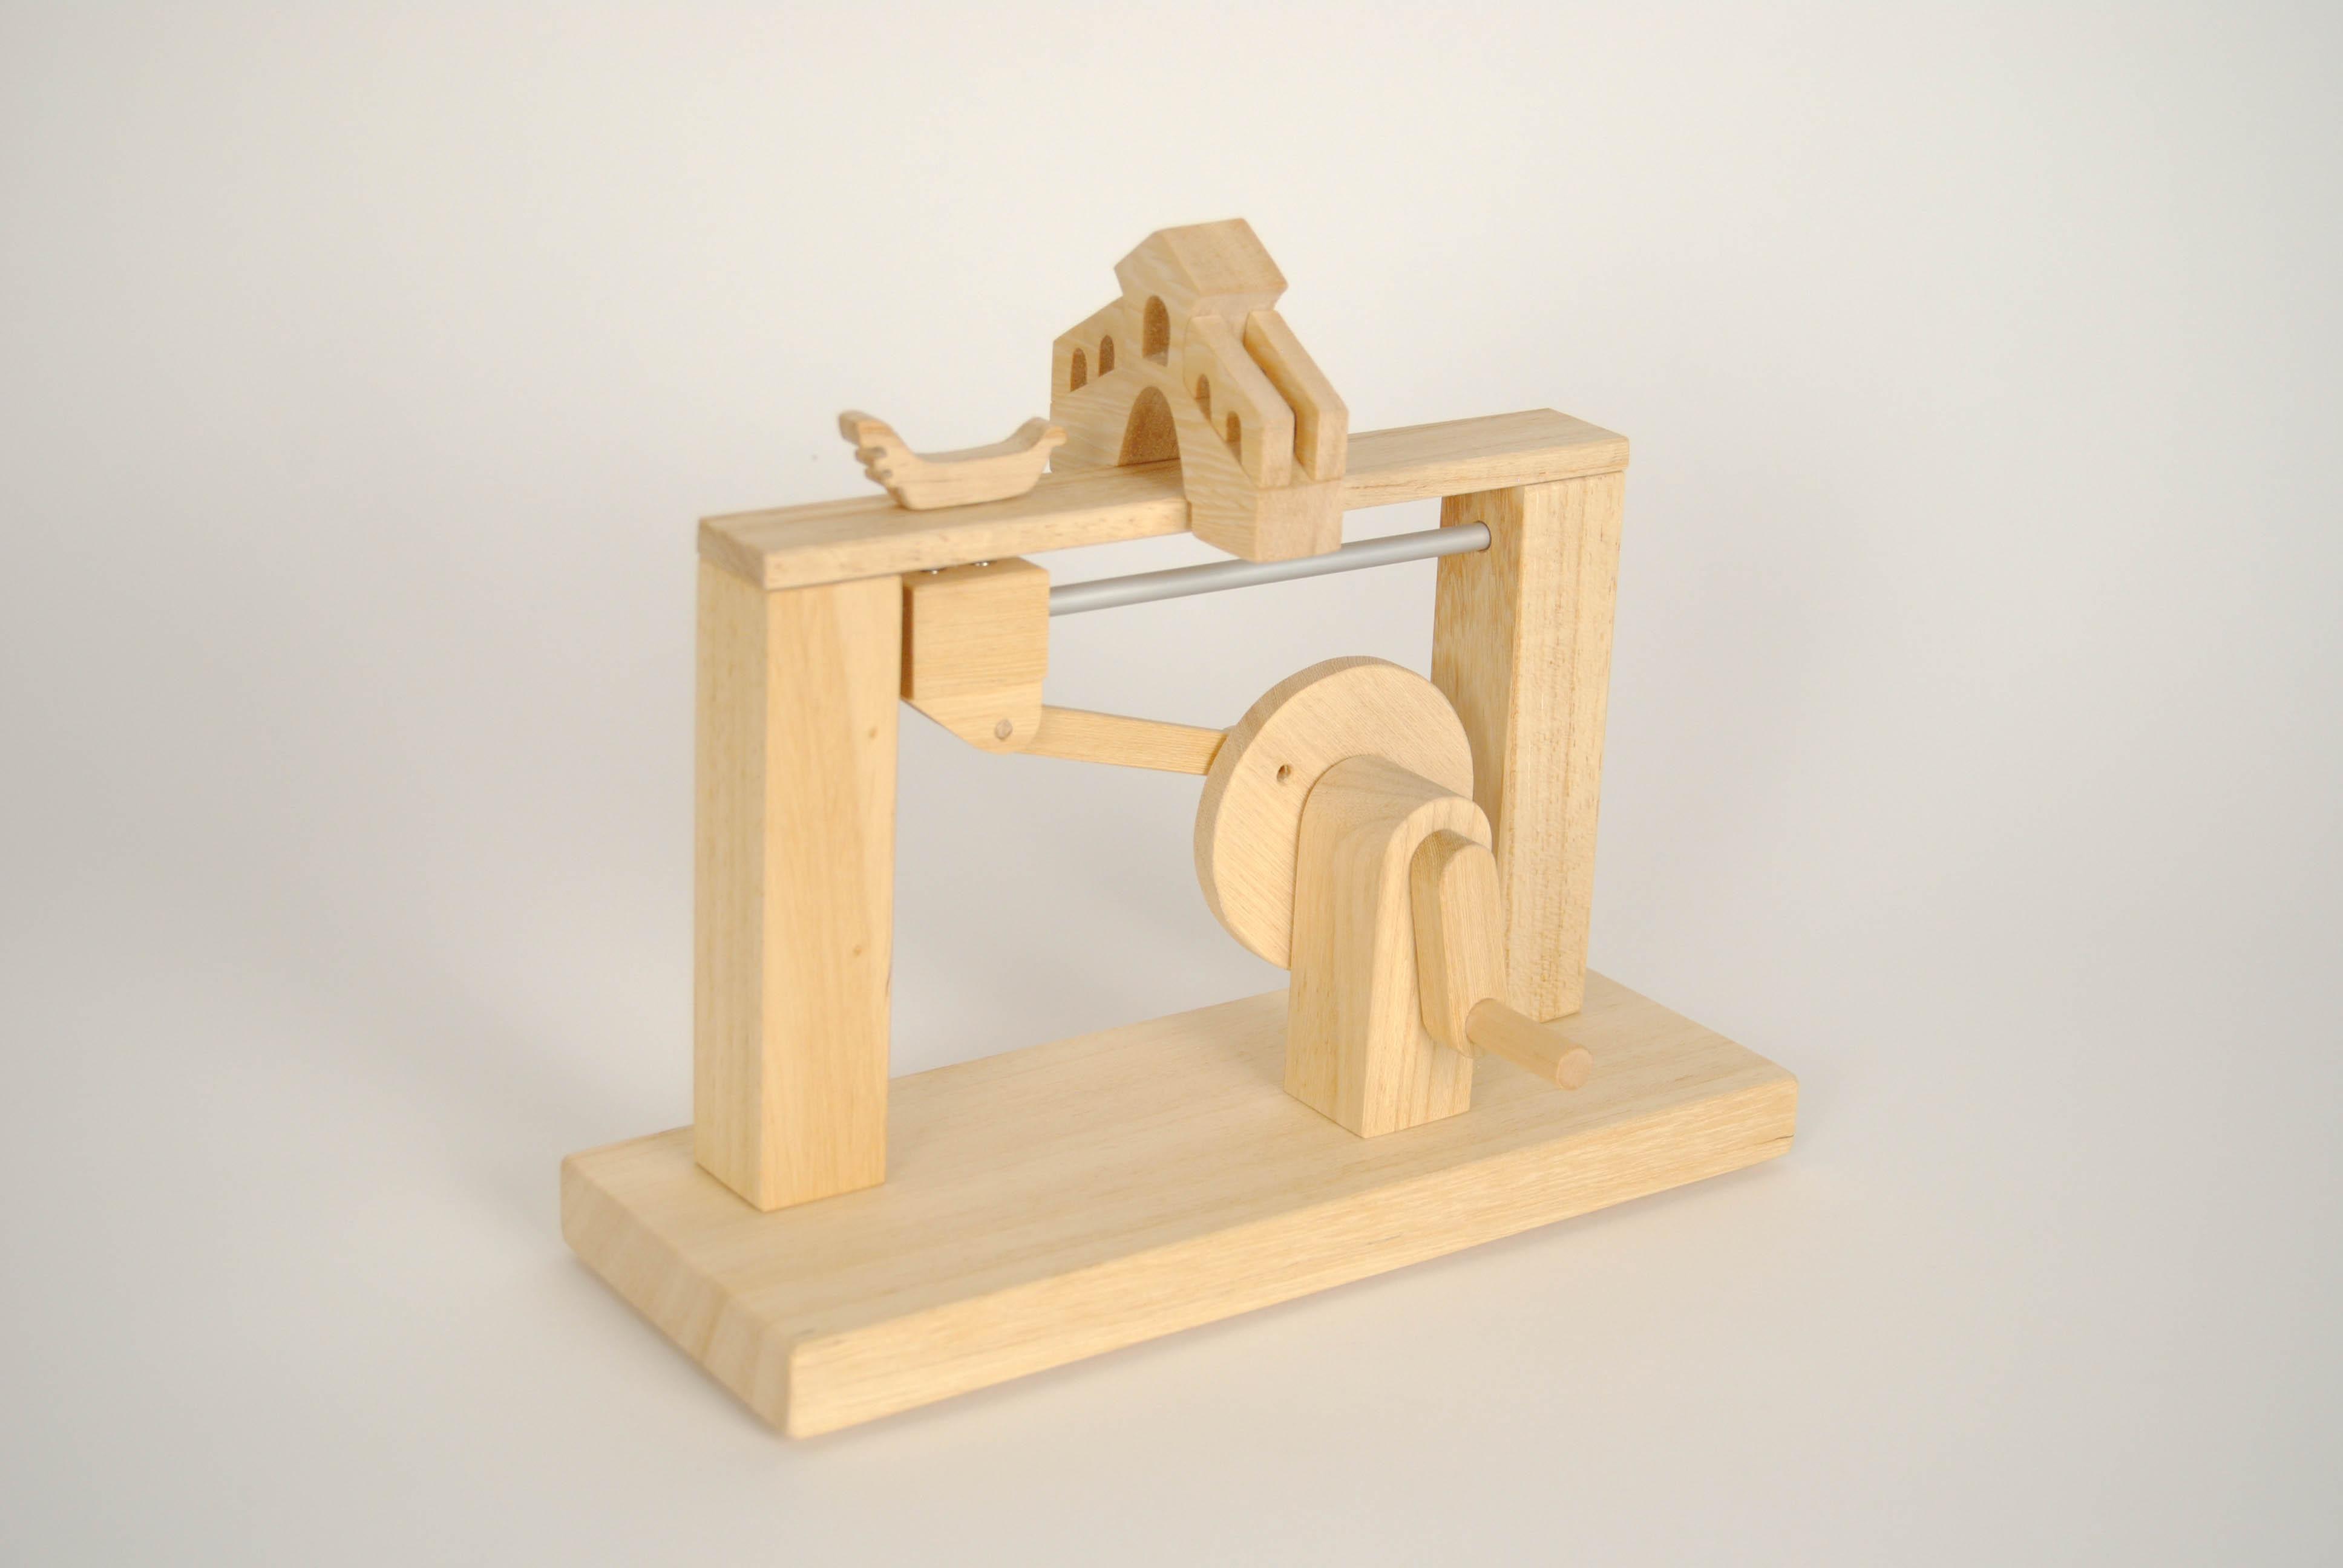 leonardo da vinci magnetic wooden toy with boat and the bridge in venice